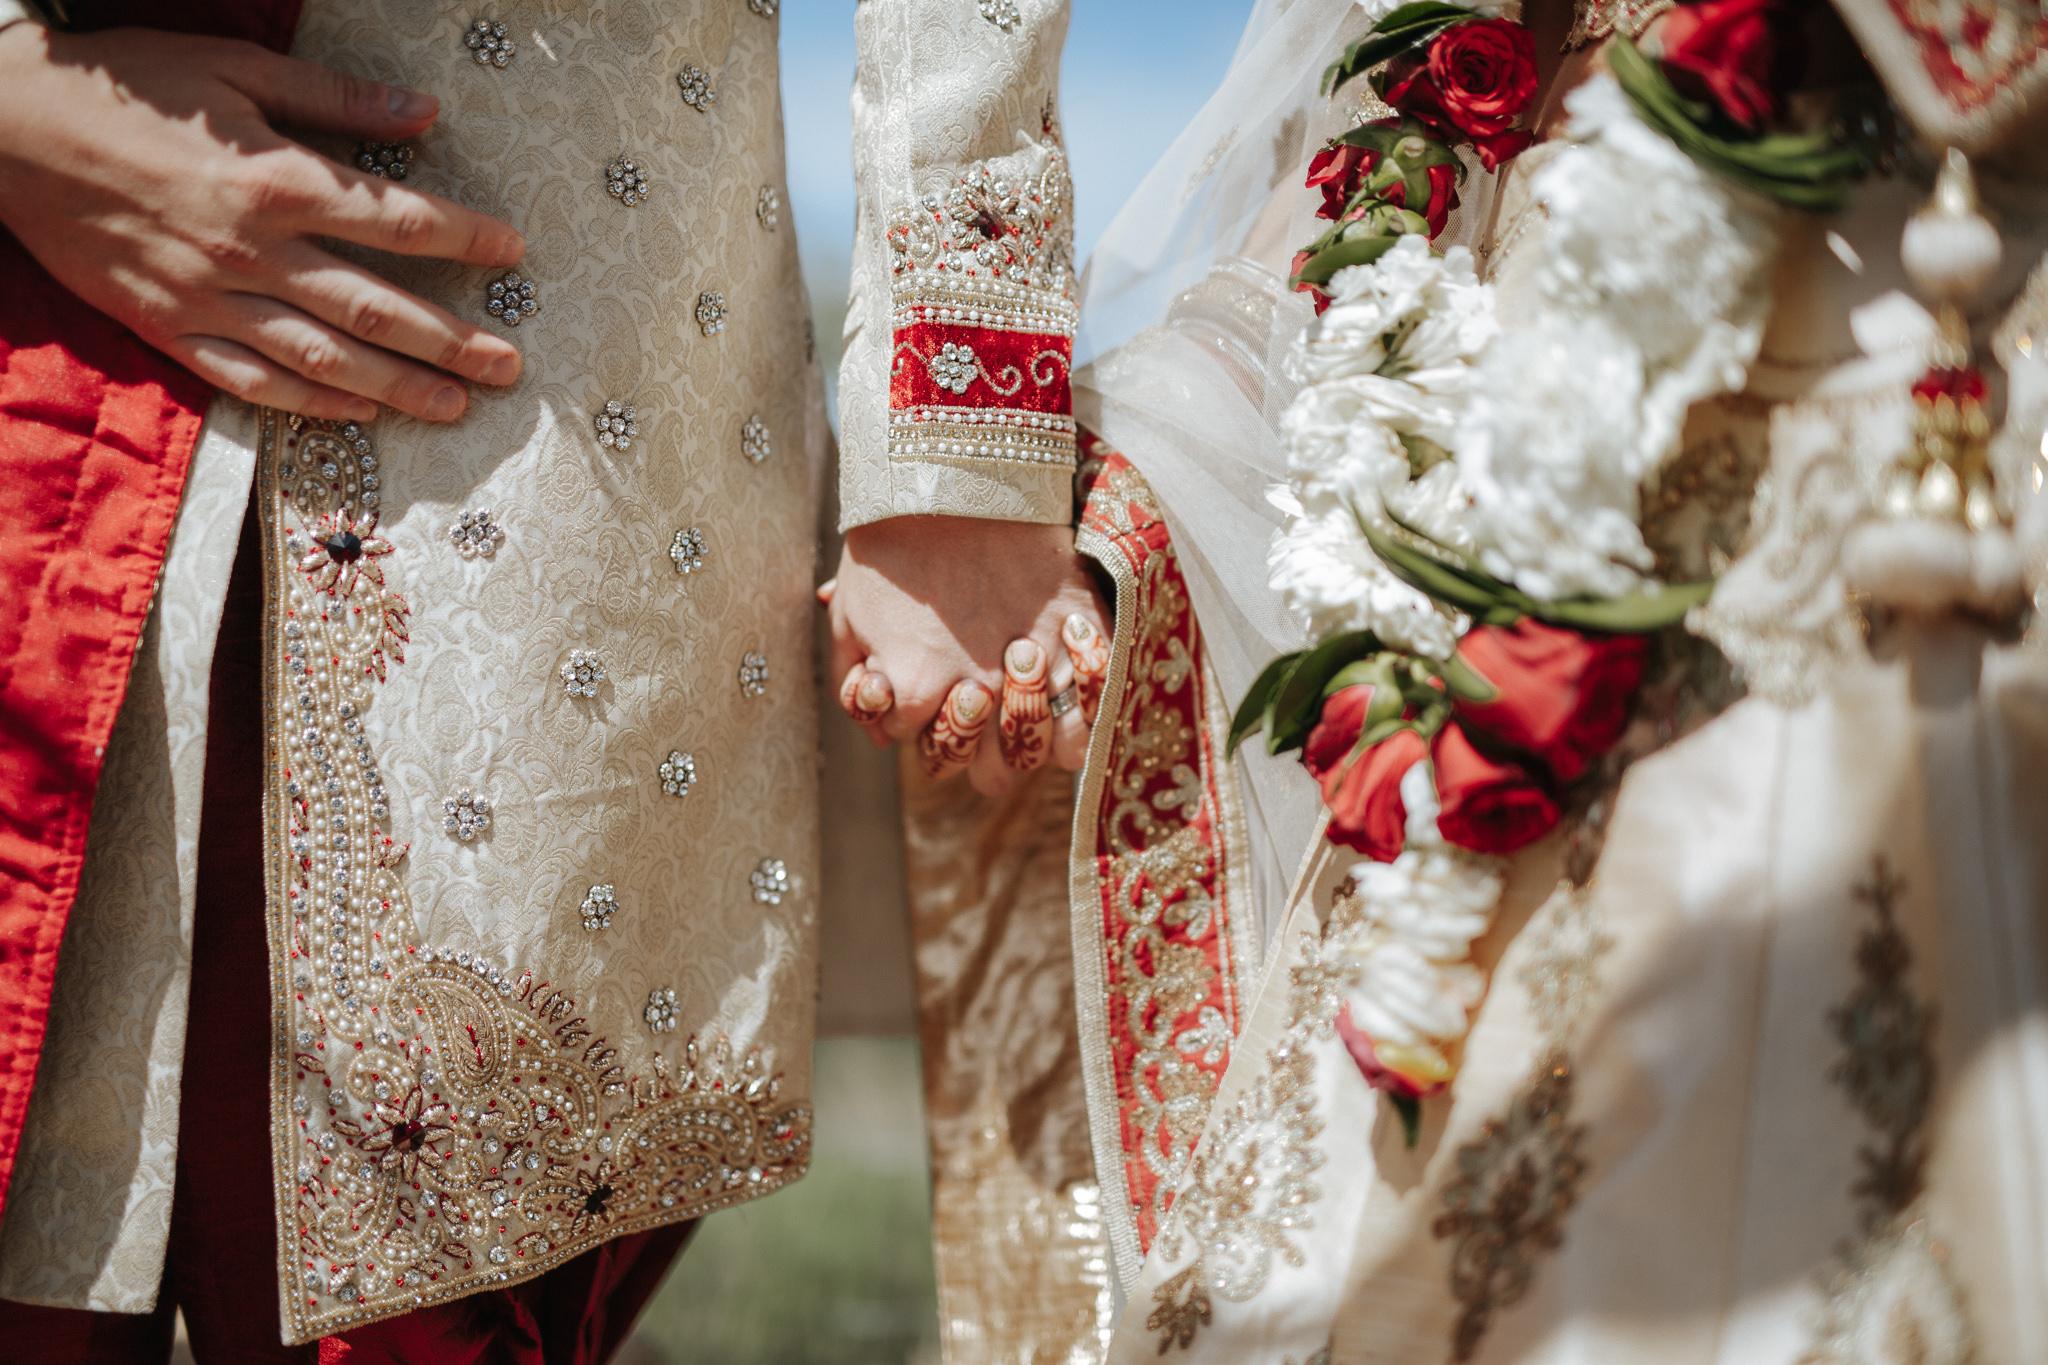 wainui-wedding-blog-aaronsami-116.jpg